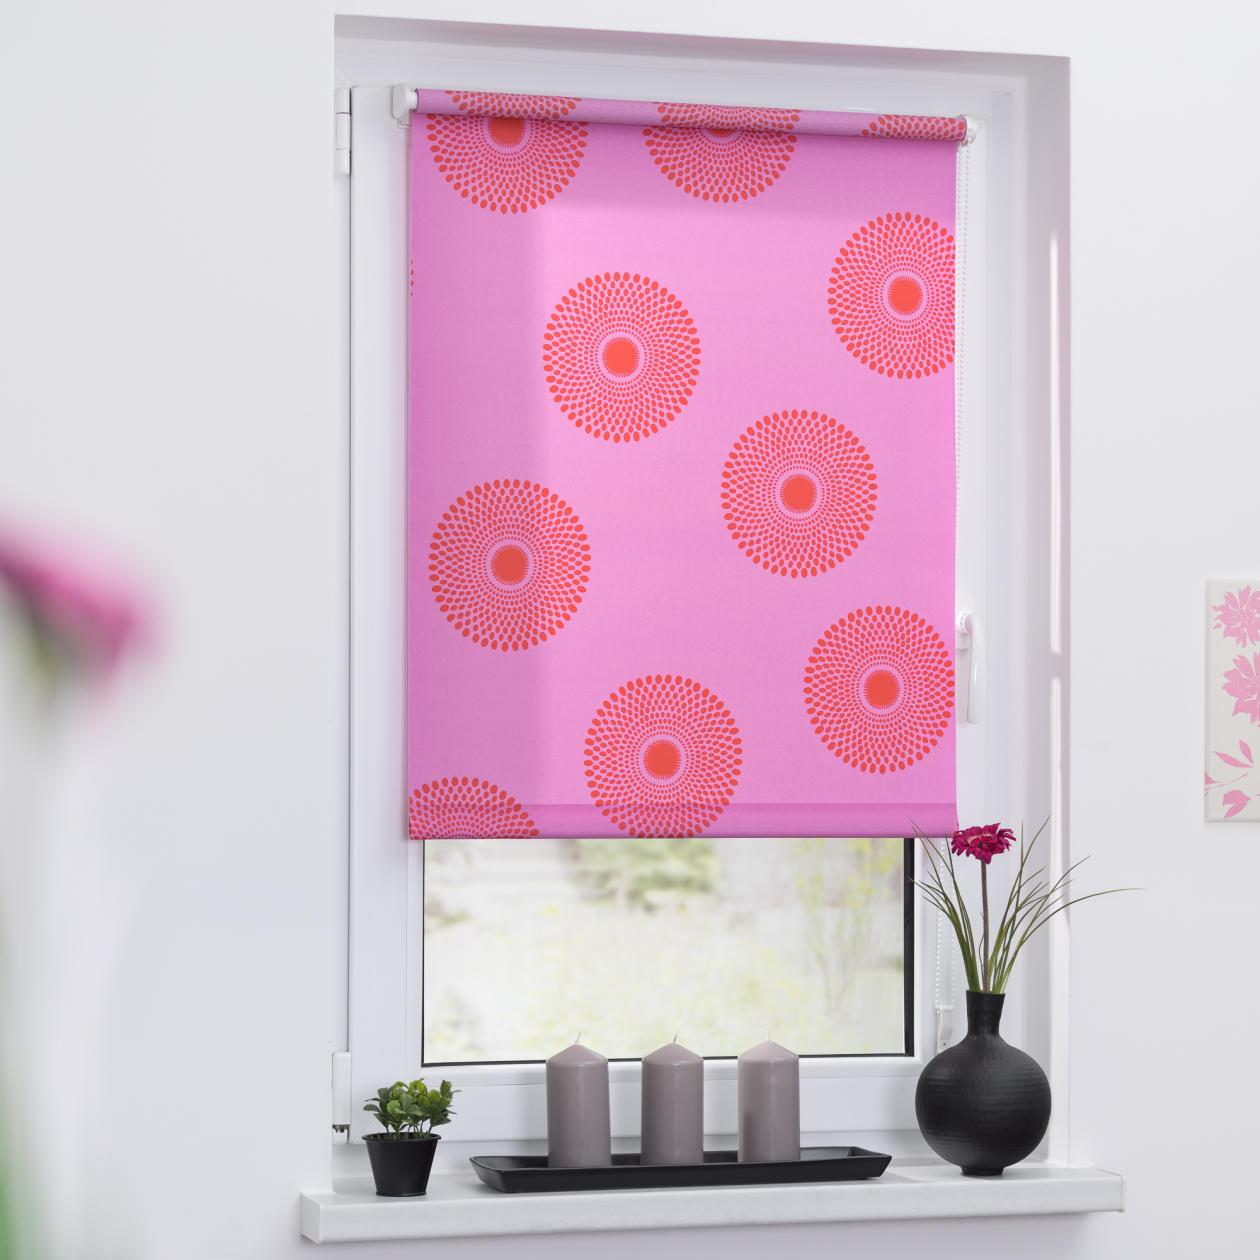 rollo klemmfix ohne bohren blickdicht mandala lichblick shop. Black Bedroom Furniture Sets. Home Design Ideas